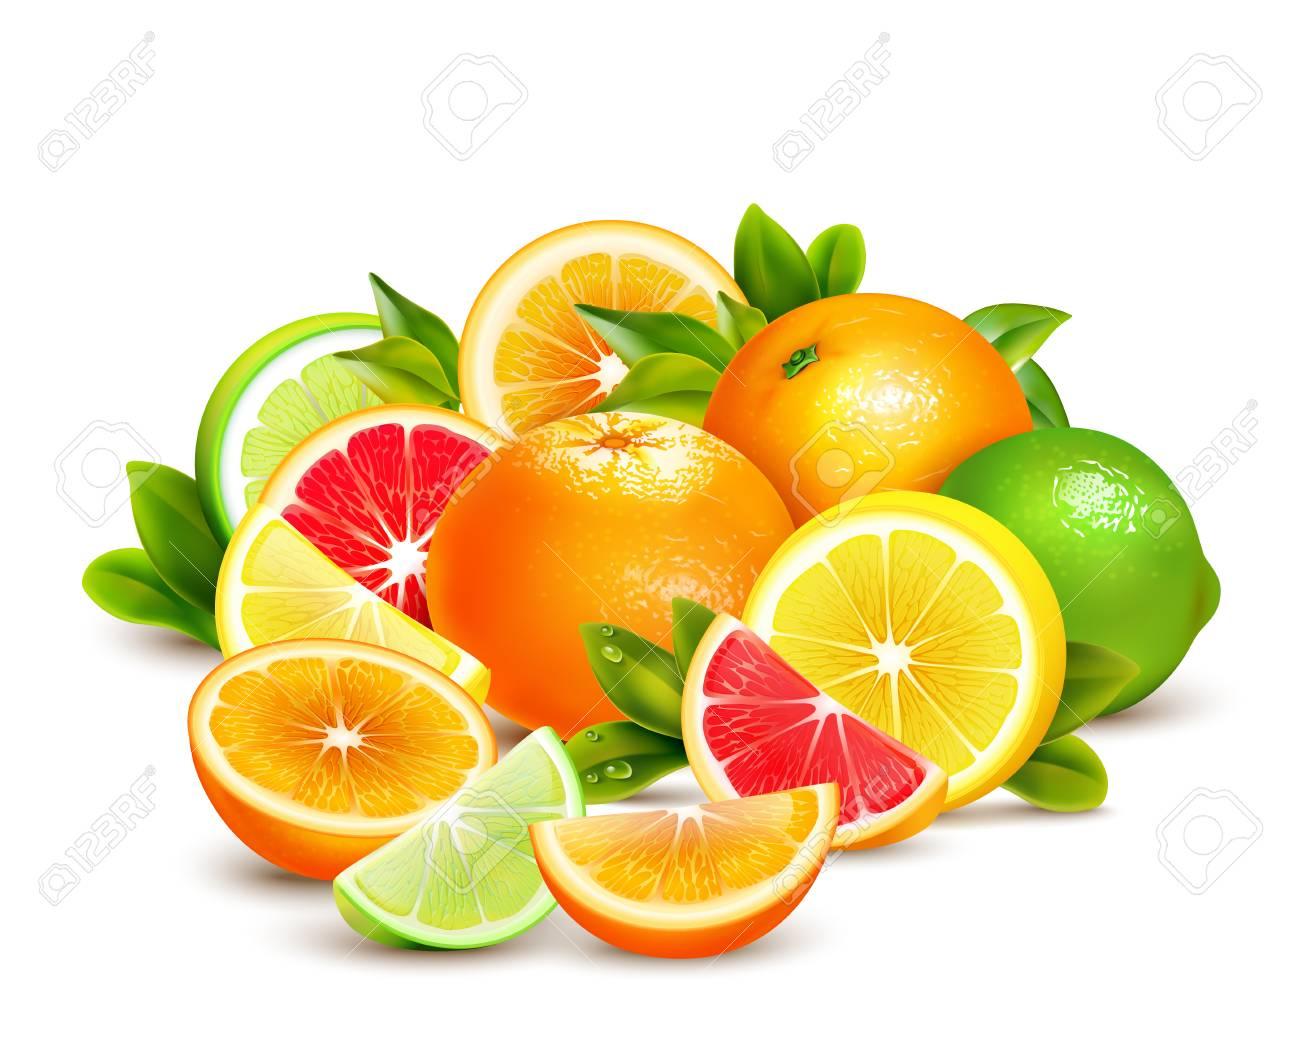 Citrus fruit whole halves and quarters colorful composition with lime lemon grapefruit and oranges realistic vector illustration - 70183366